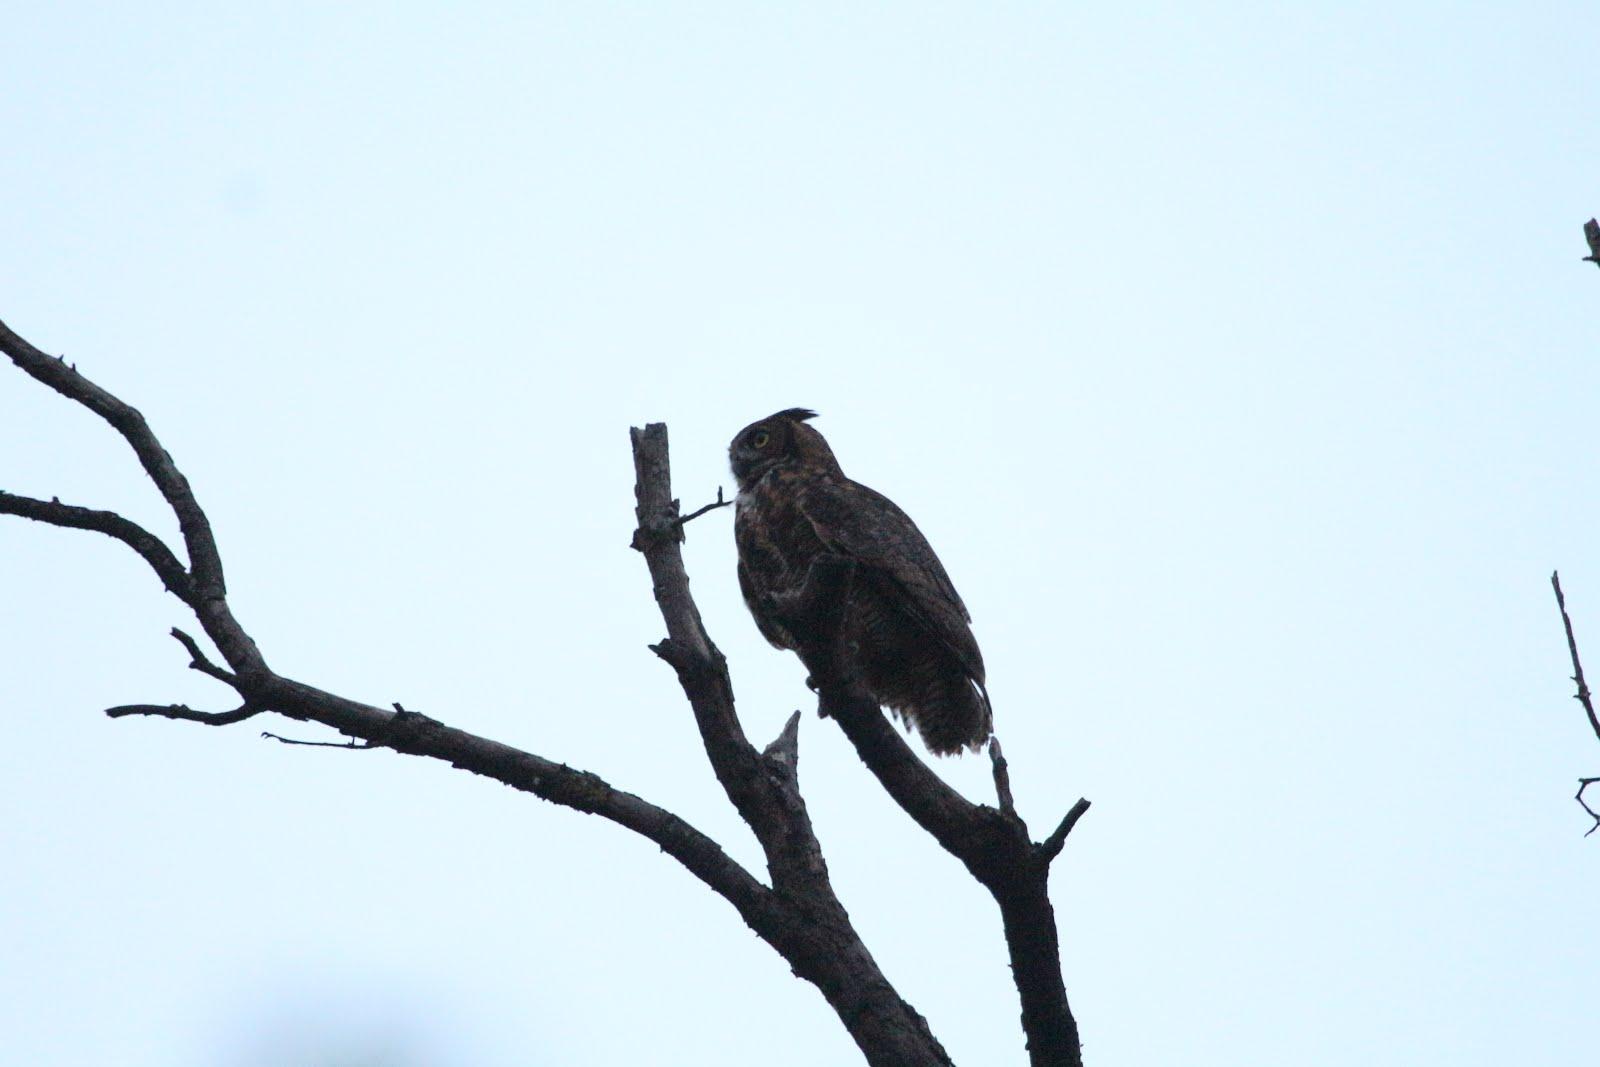 1600x1067 Forest Park Owls December 2015